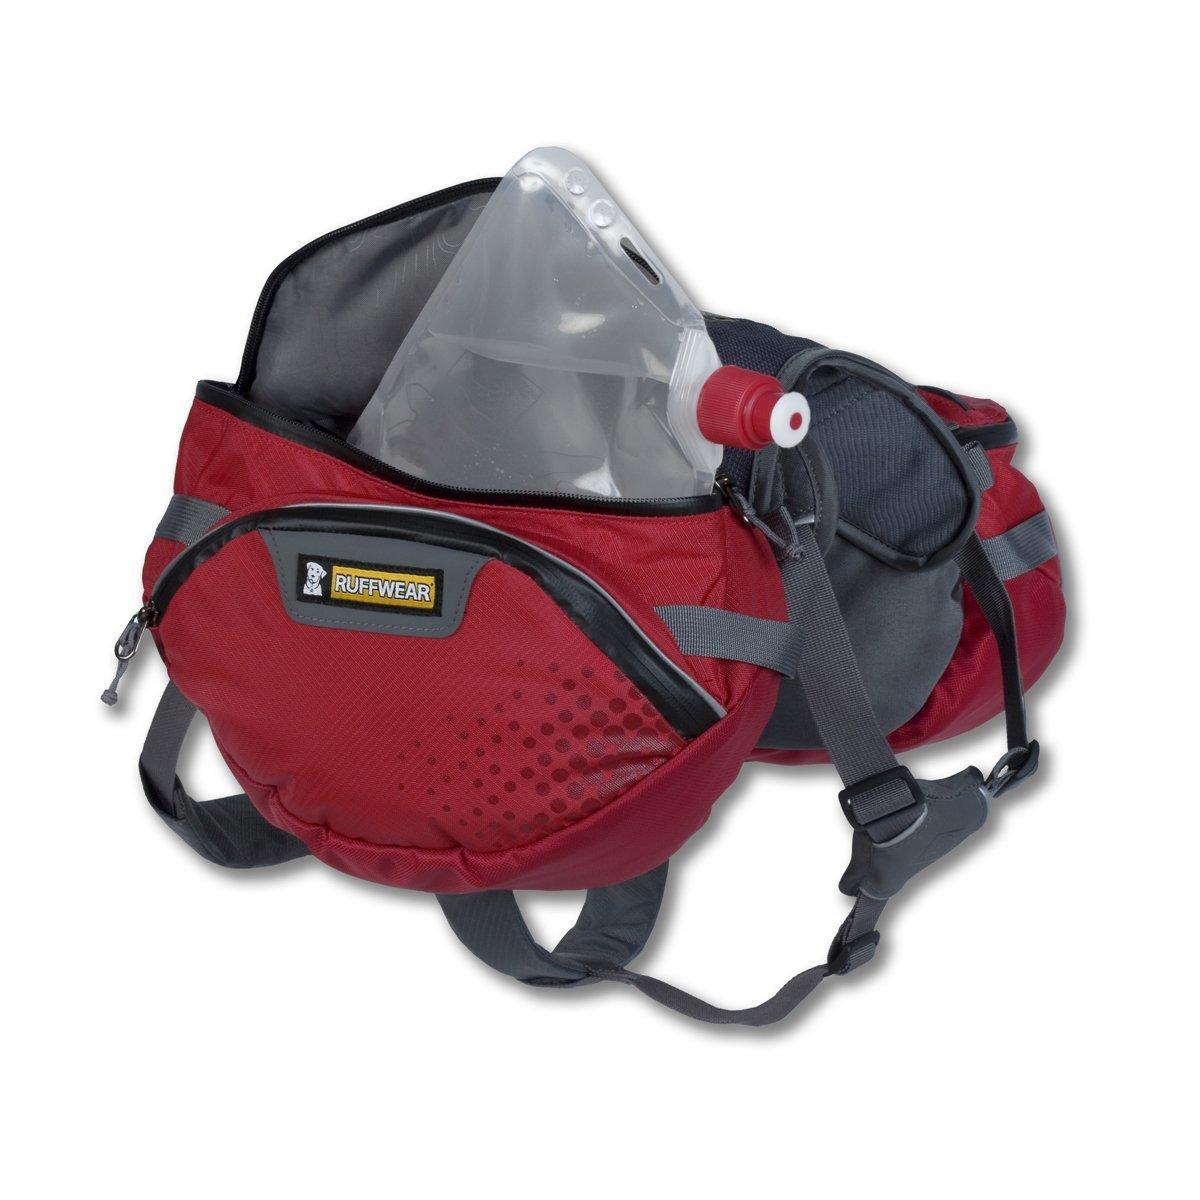 146e48e58ca2 Dog Backpack includes water bladders that dissipate heat